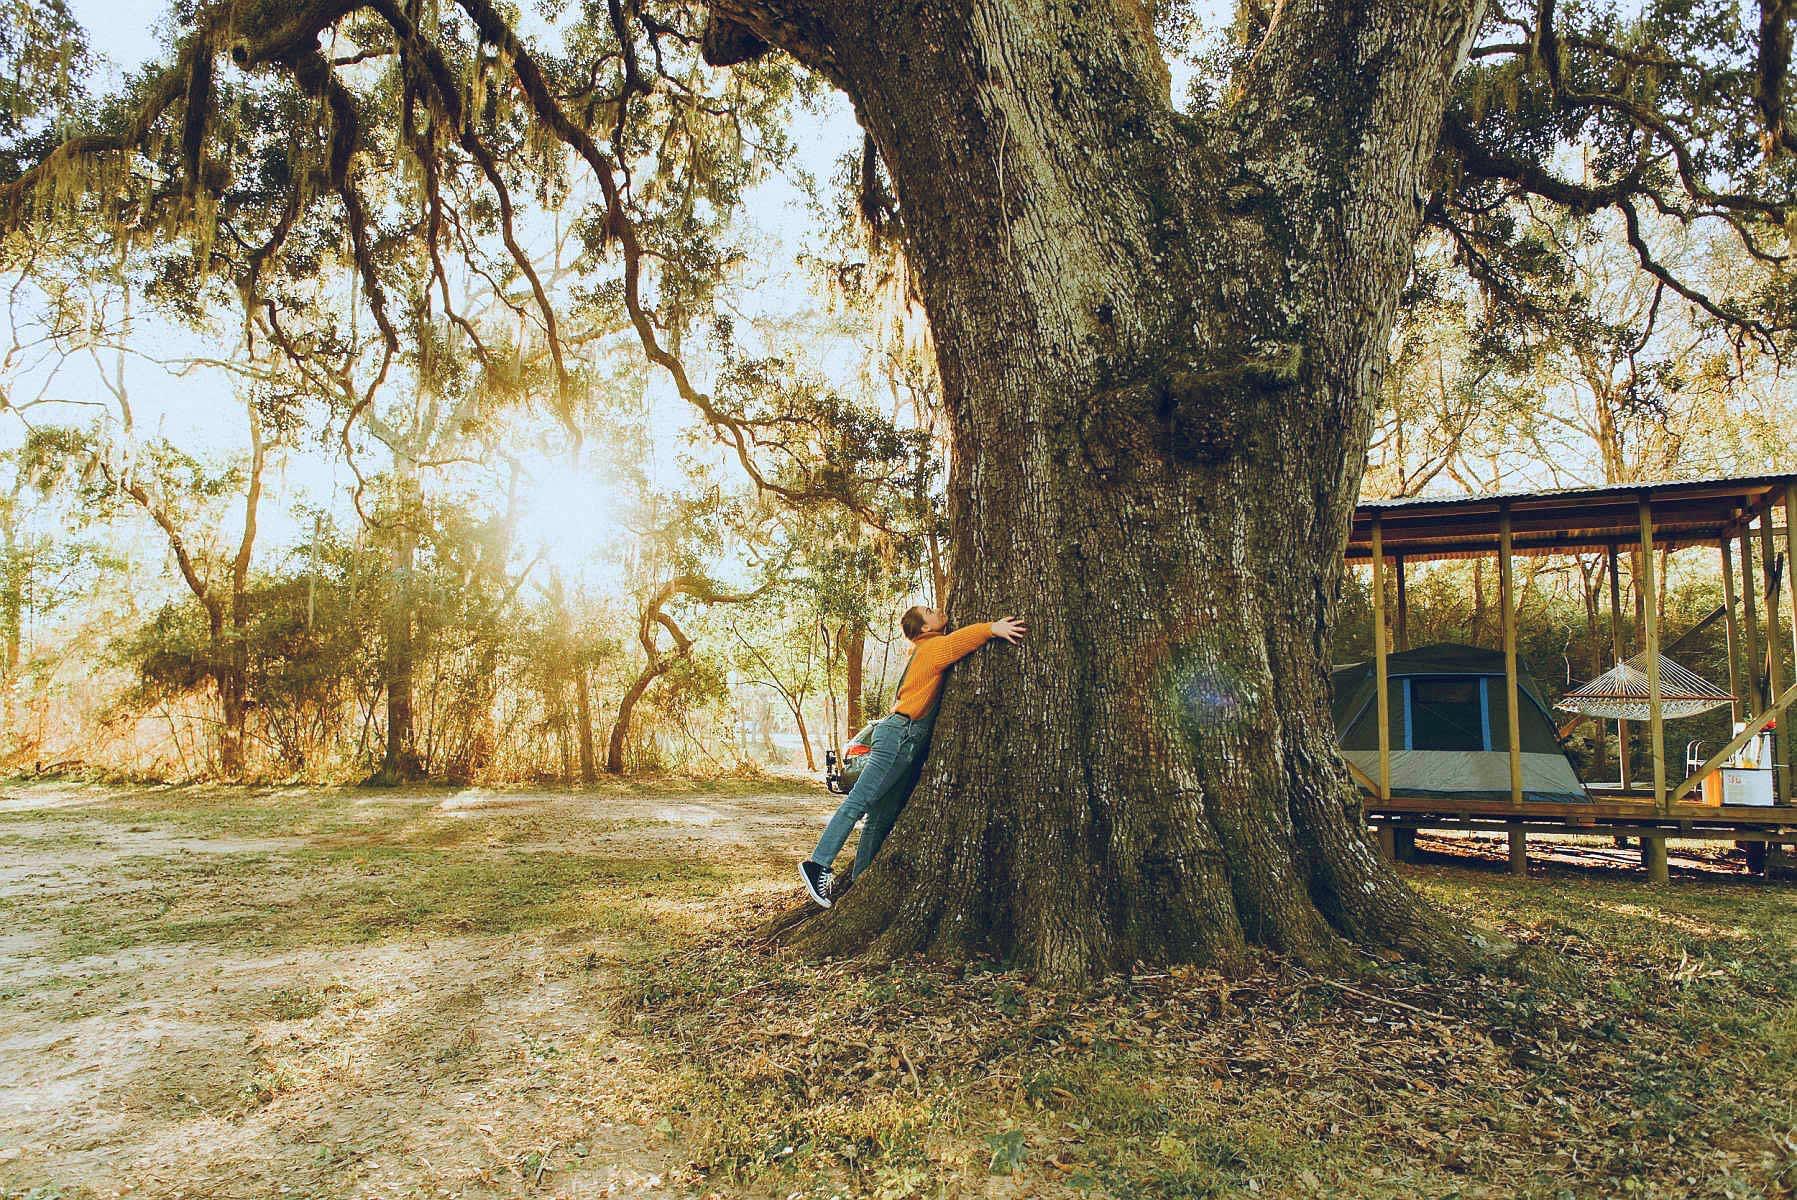 Woodlands antebellum swinger consider, that